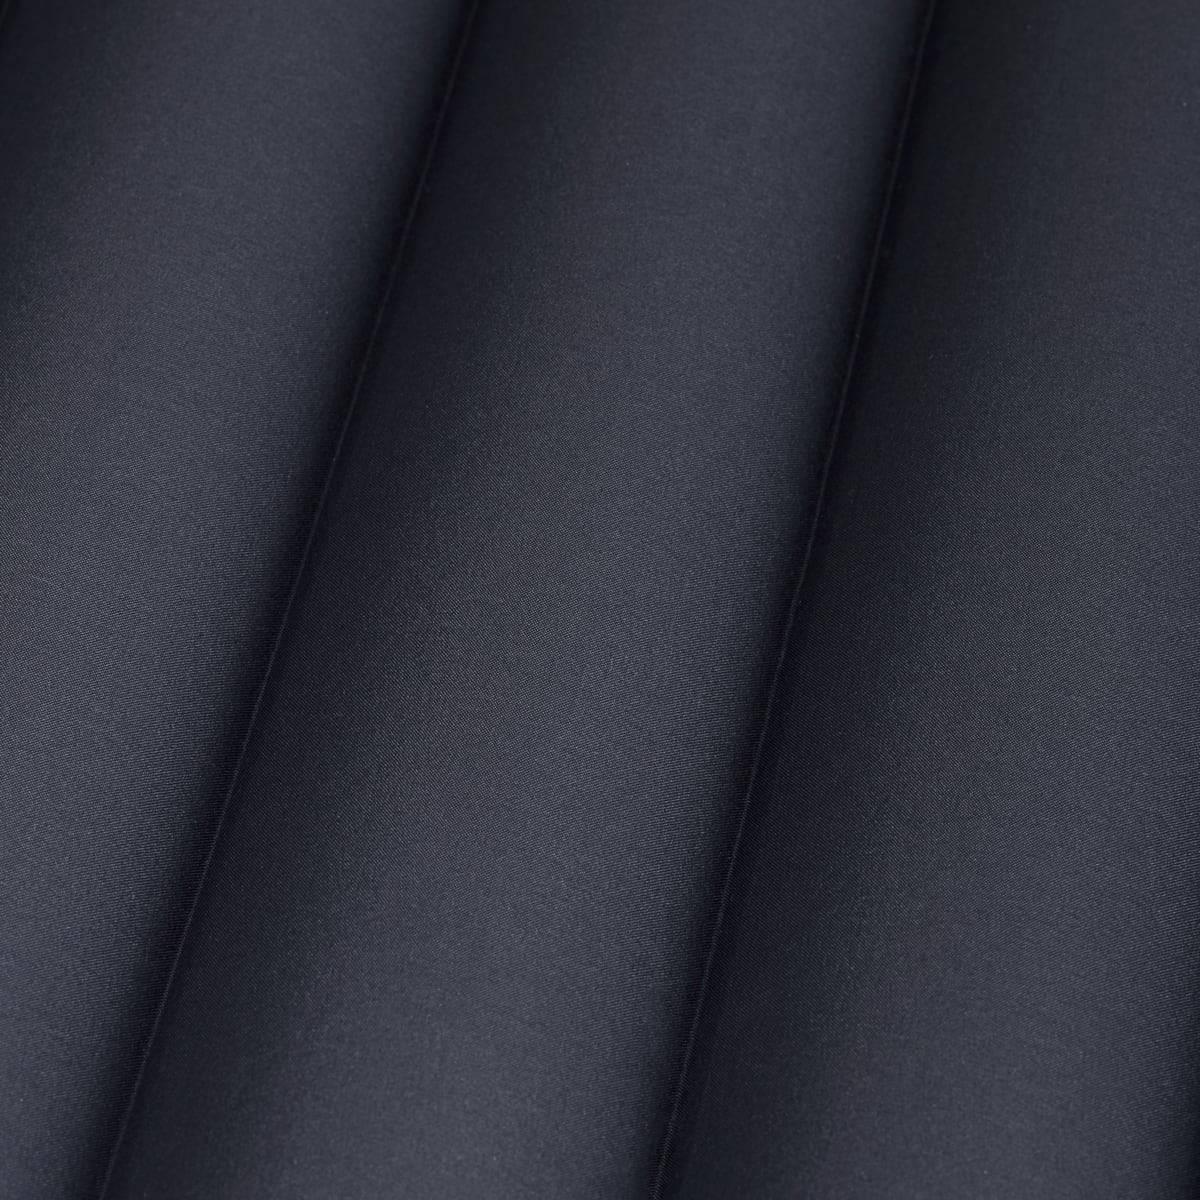 Mammut Comfort Mat Charcoal Black